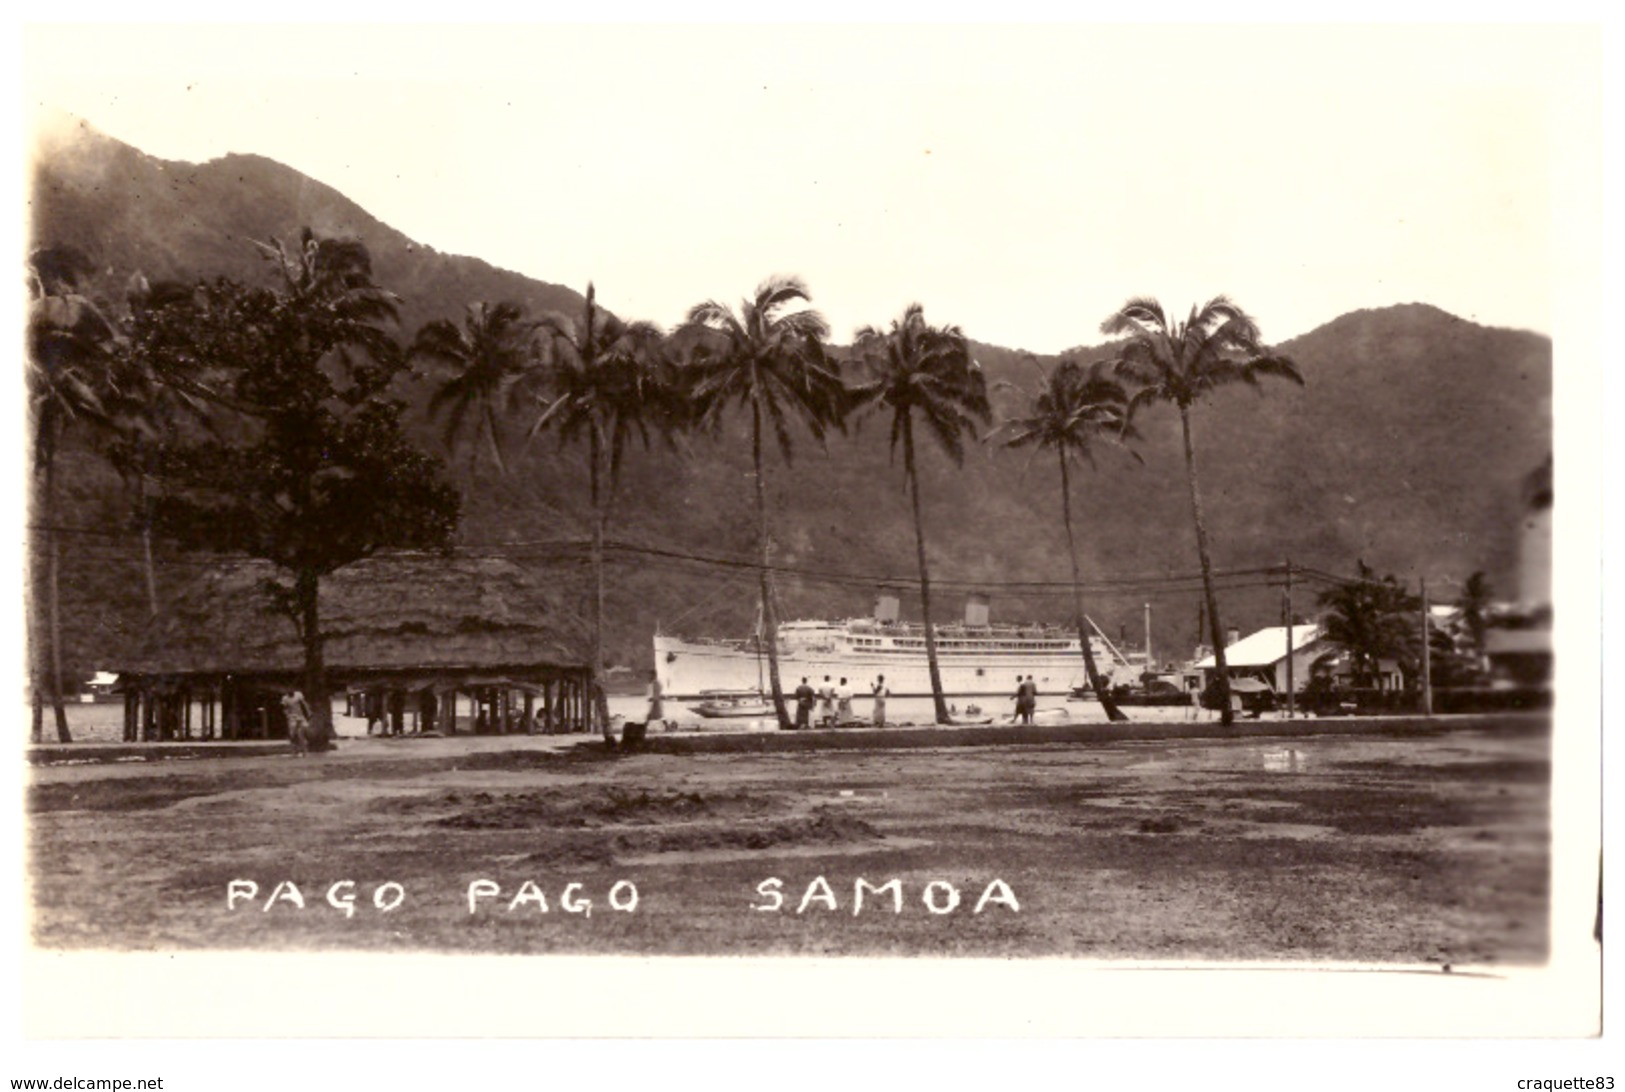 PAGO PAGO  SAMOA  AMERICAINES   PAQUEBOT  DEVANT L'ILE  VUE DU PORT     CARTE ANIMEE - Samoa